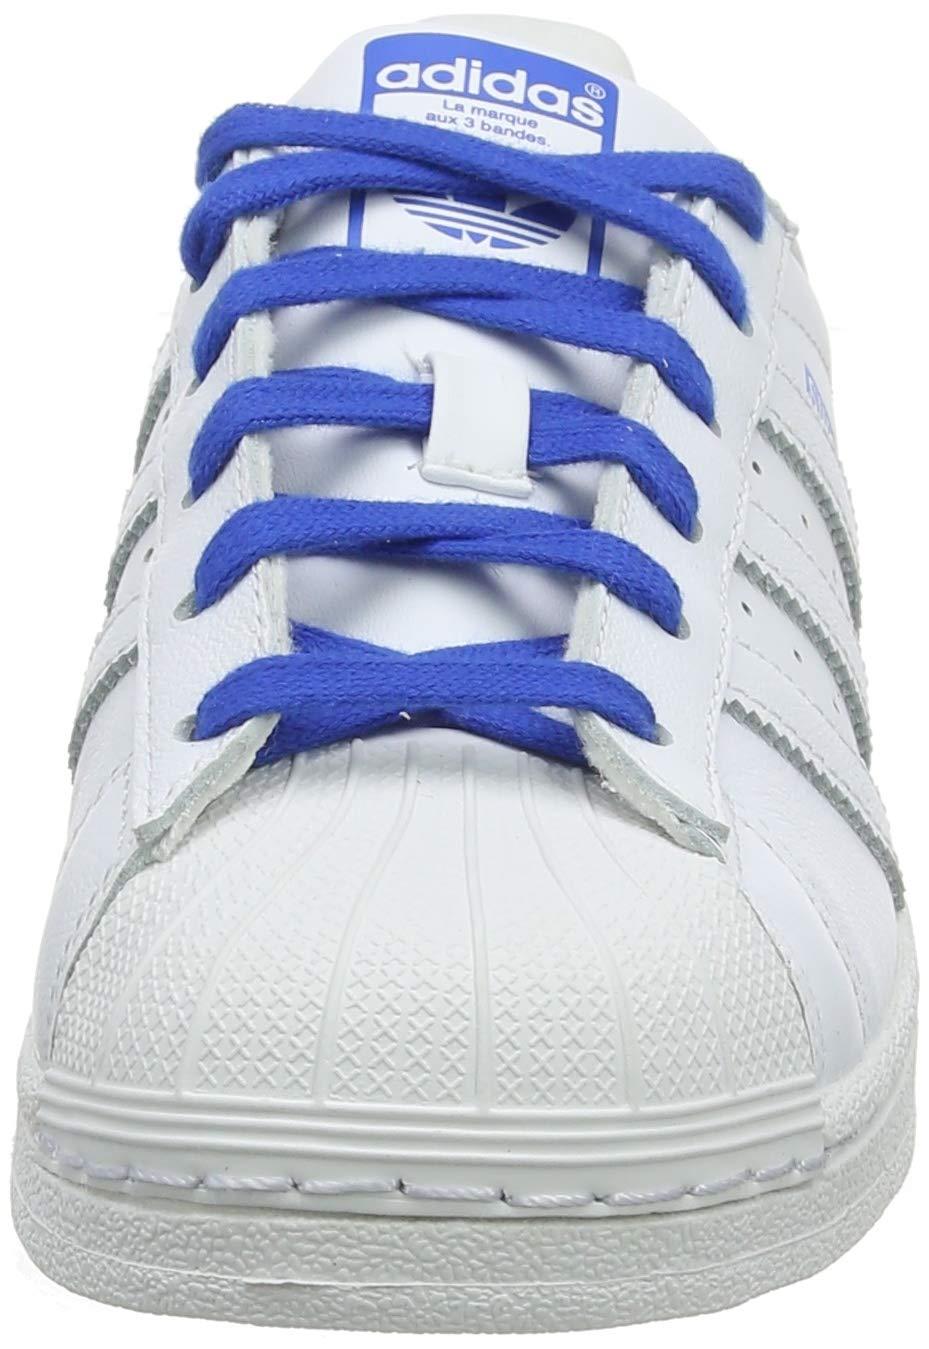 adidas Superstar J, Scarpe da Ginnastica Unisex-Bambini 9 spesavip